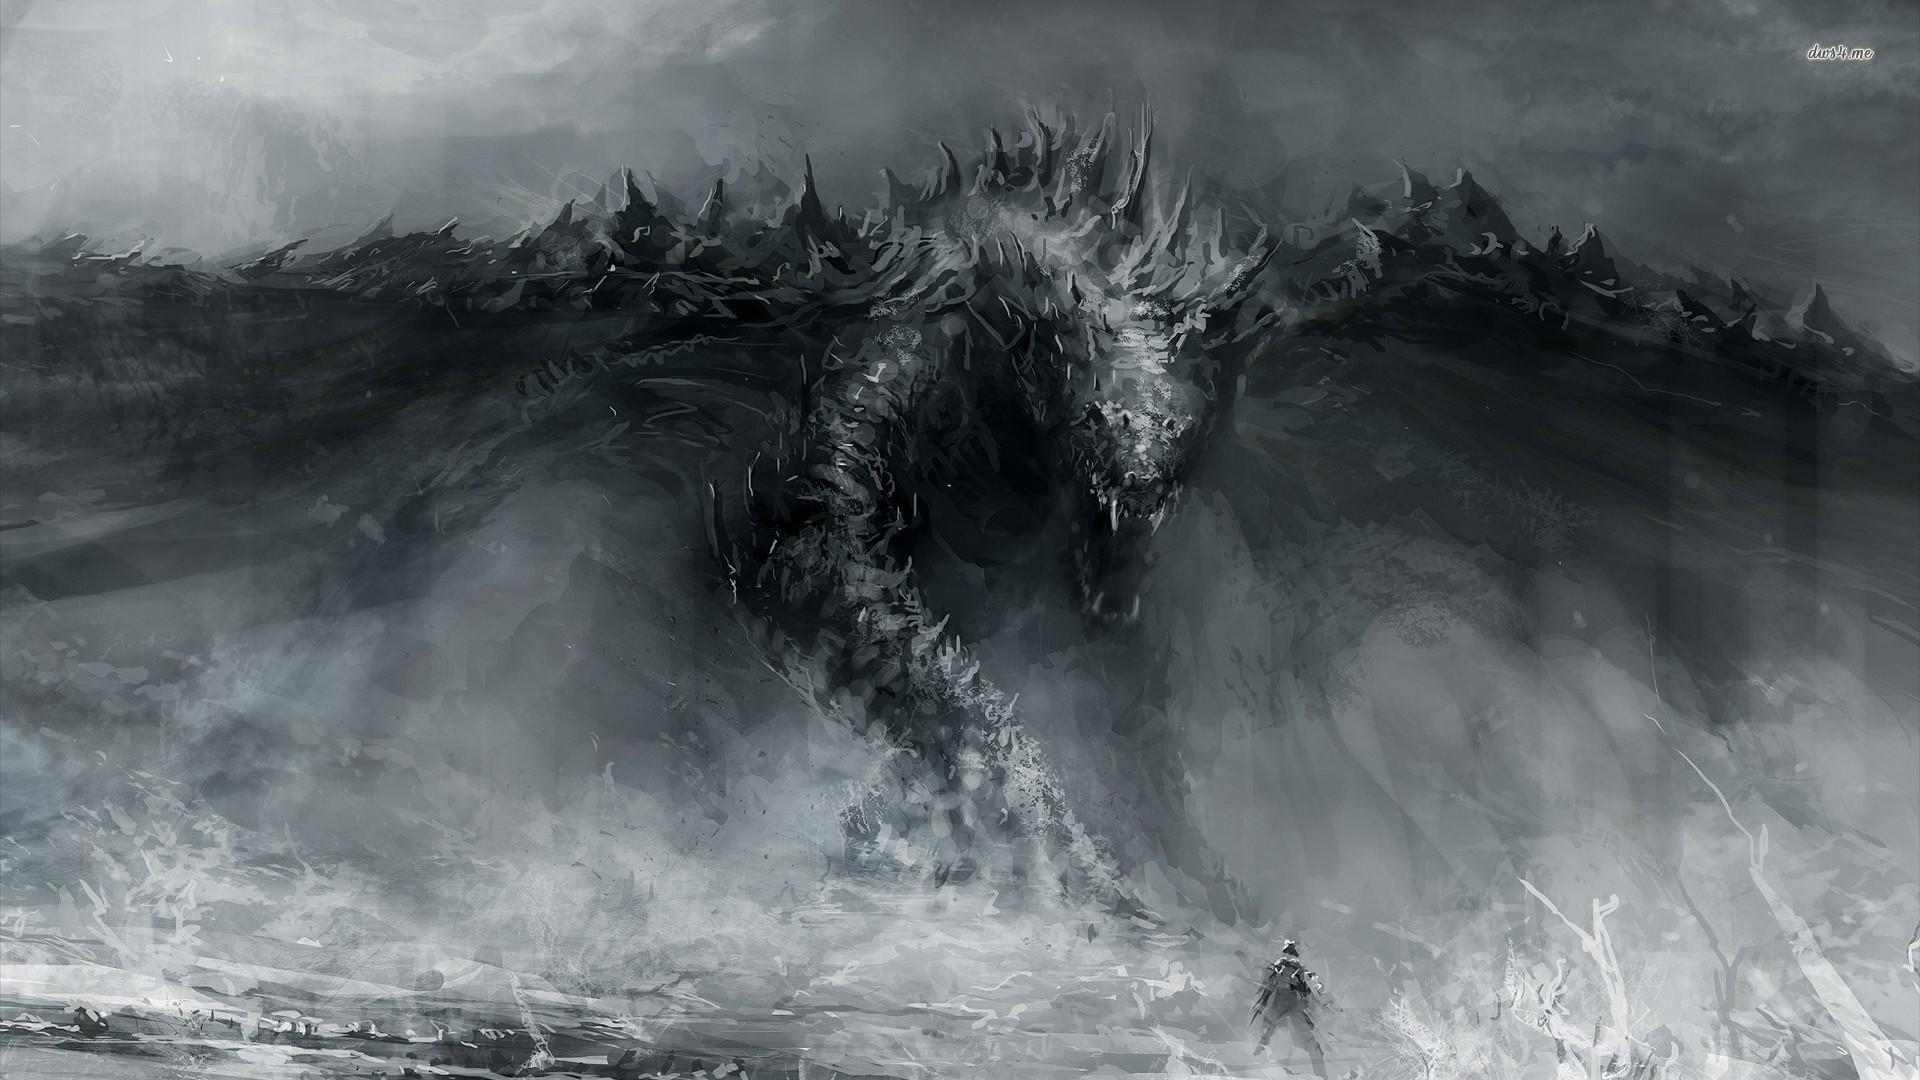 wallpaper.wiki-Ice-Dragon-Wallpaper-Free-Download-PIC-